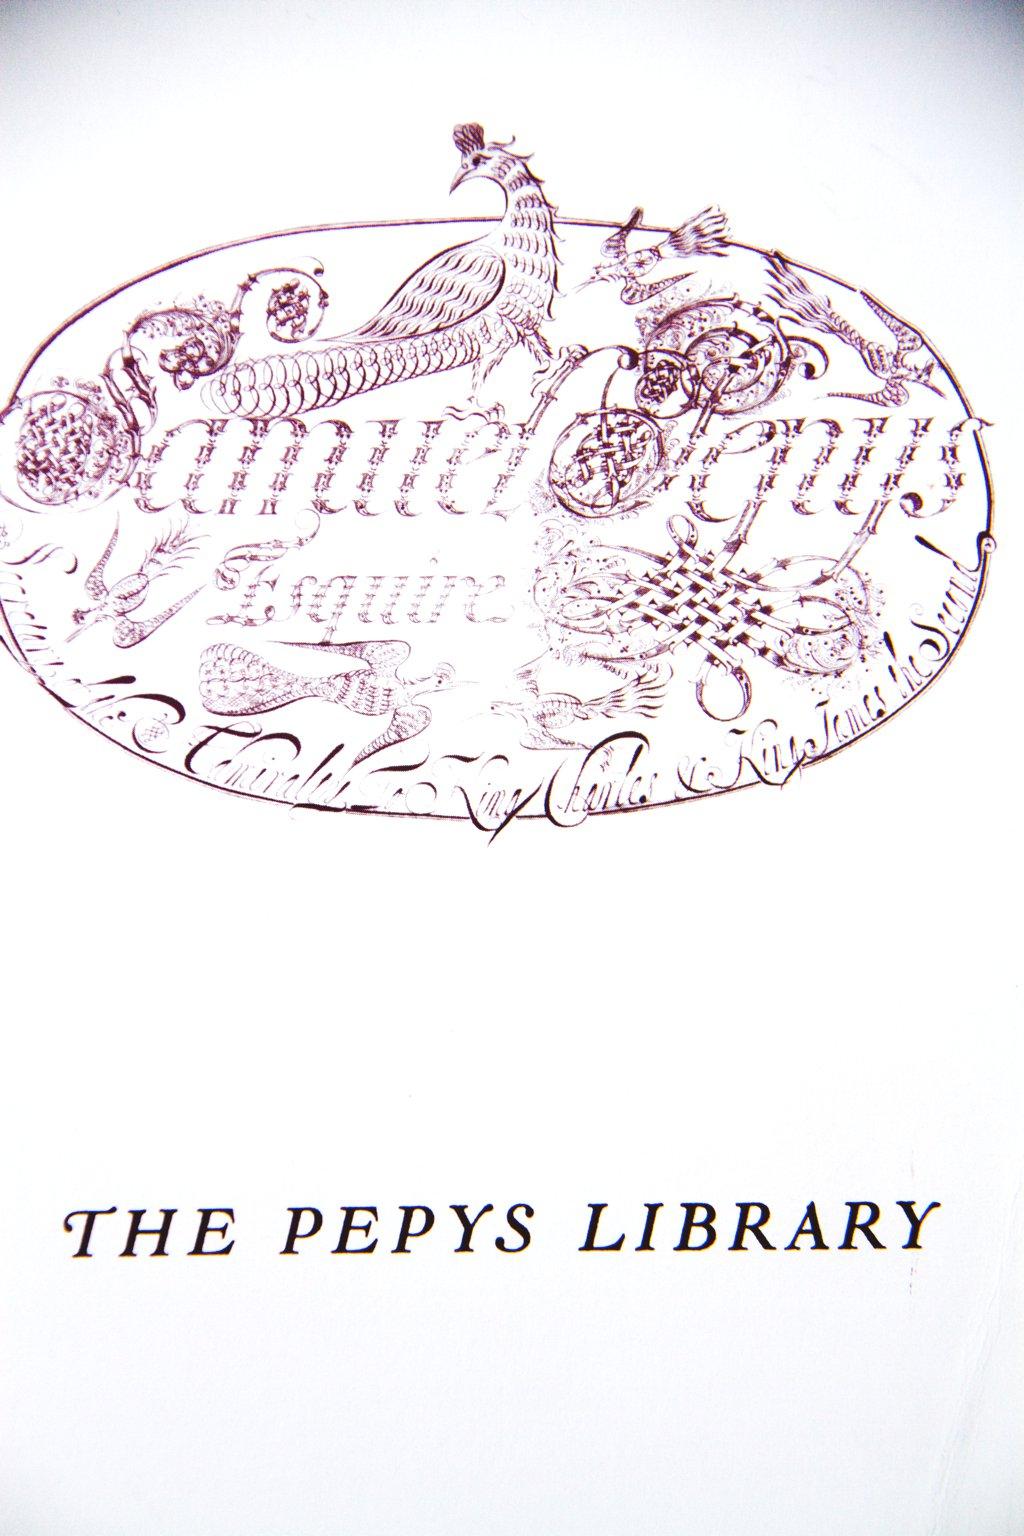 Cambridge Pepys Library Broschüre